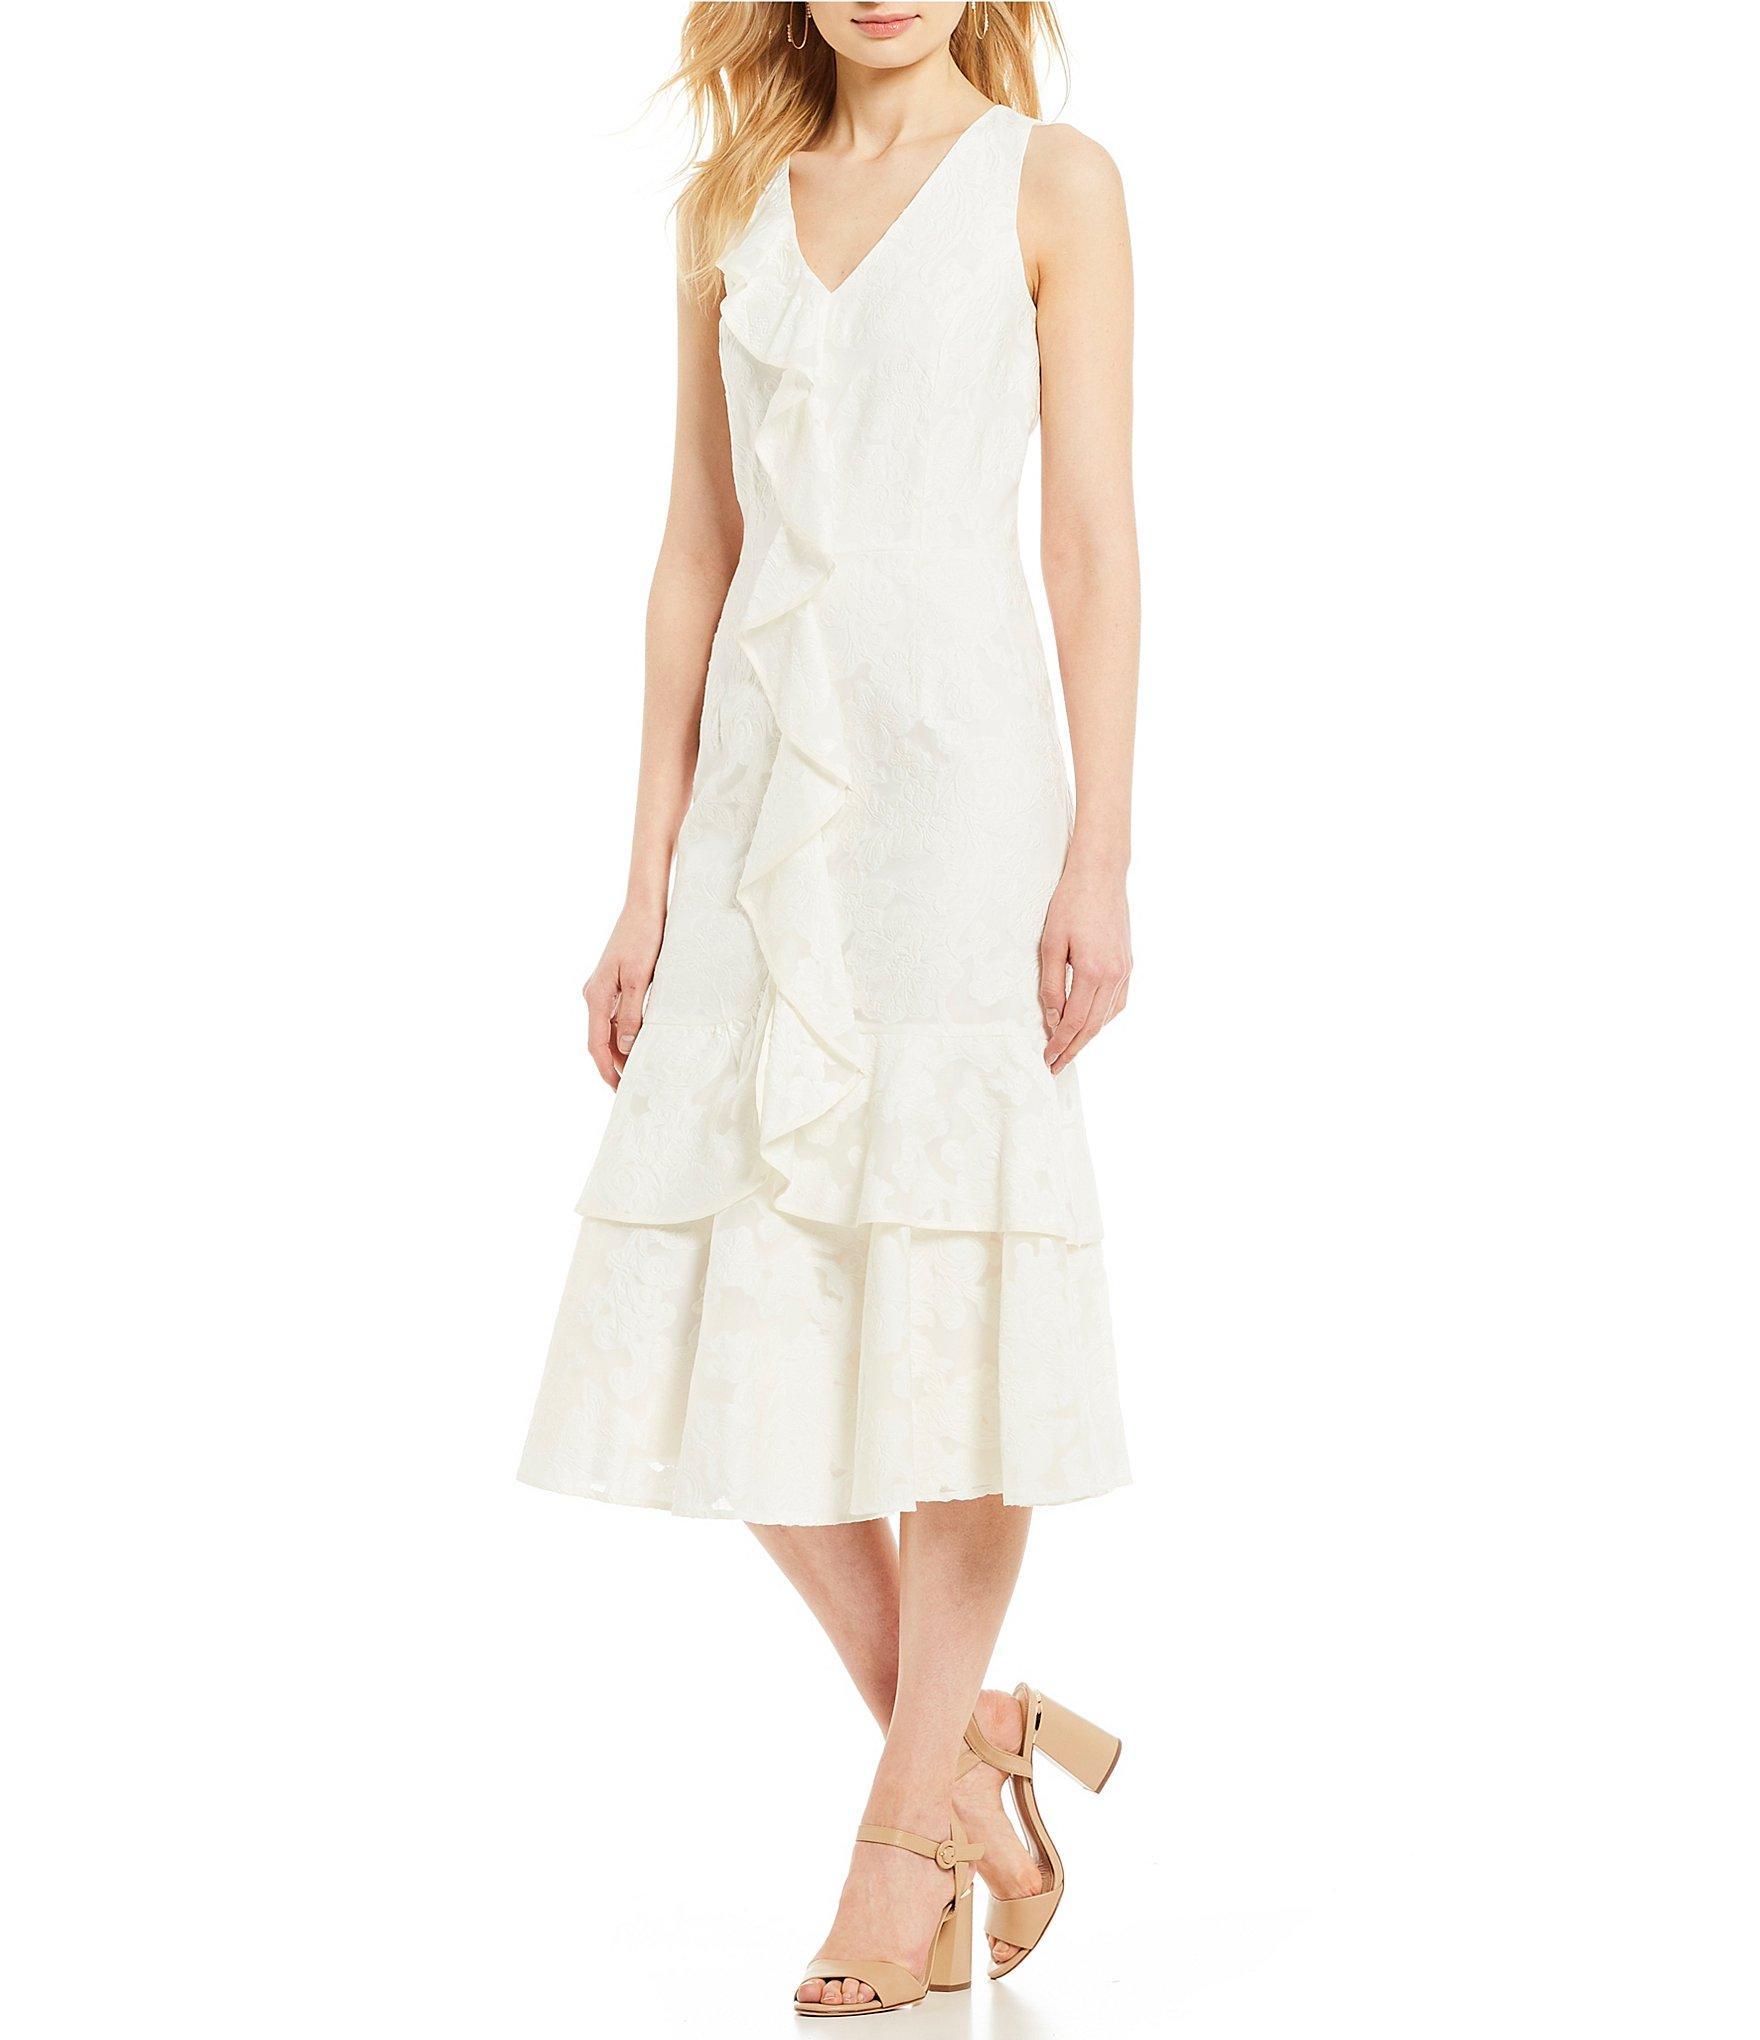 6e64fa0a1b Antonio Melani - White Sami Tiered Ruffle Midi Dress - Lyst. View fullscreen